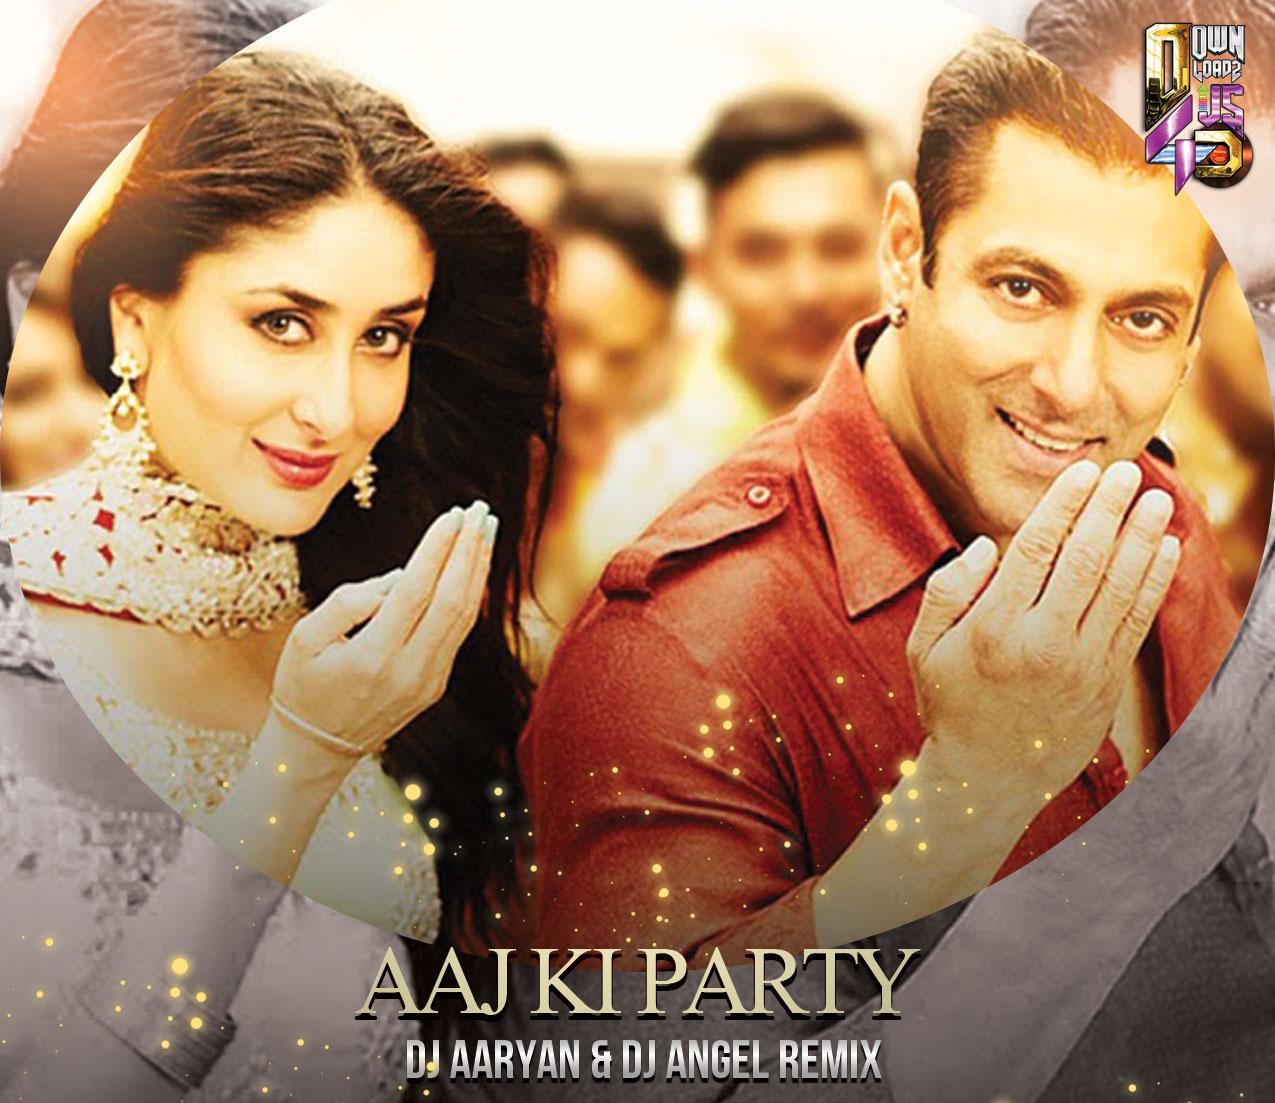 Daru Badnam Dj Remix Sapna: Dj Aaryan & Dj Angel